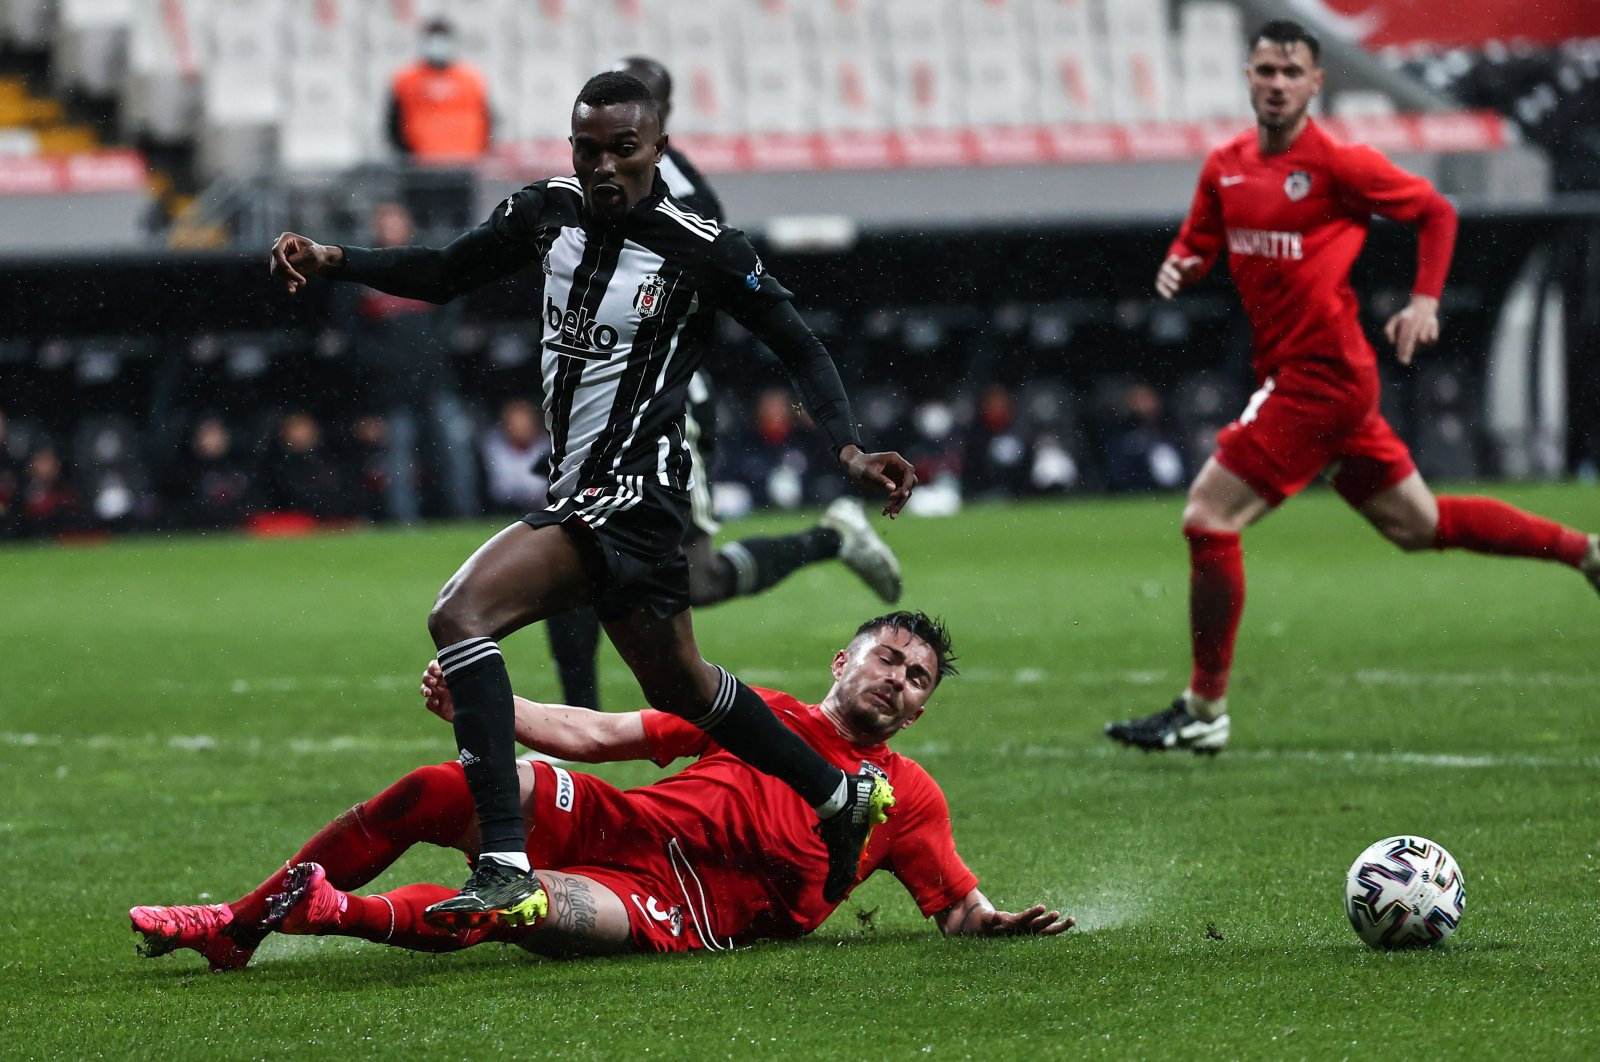 Beşiktaş player Bernard Mensah (running) and Gaziantep player Alin Toşça (on the fllor) at the Turkish Süper Lig game at Vodafone Arena in Istanbul on March 6, 2021 (AA Photo)